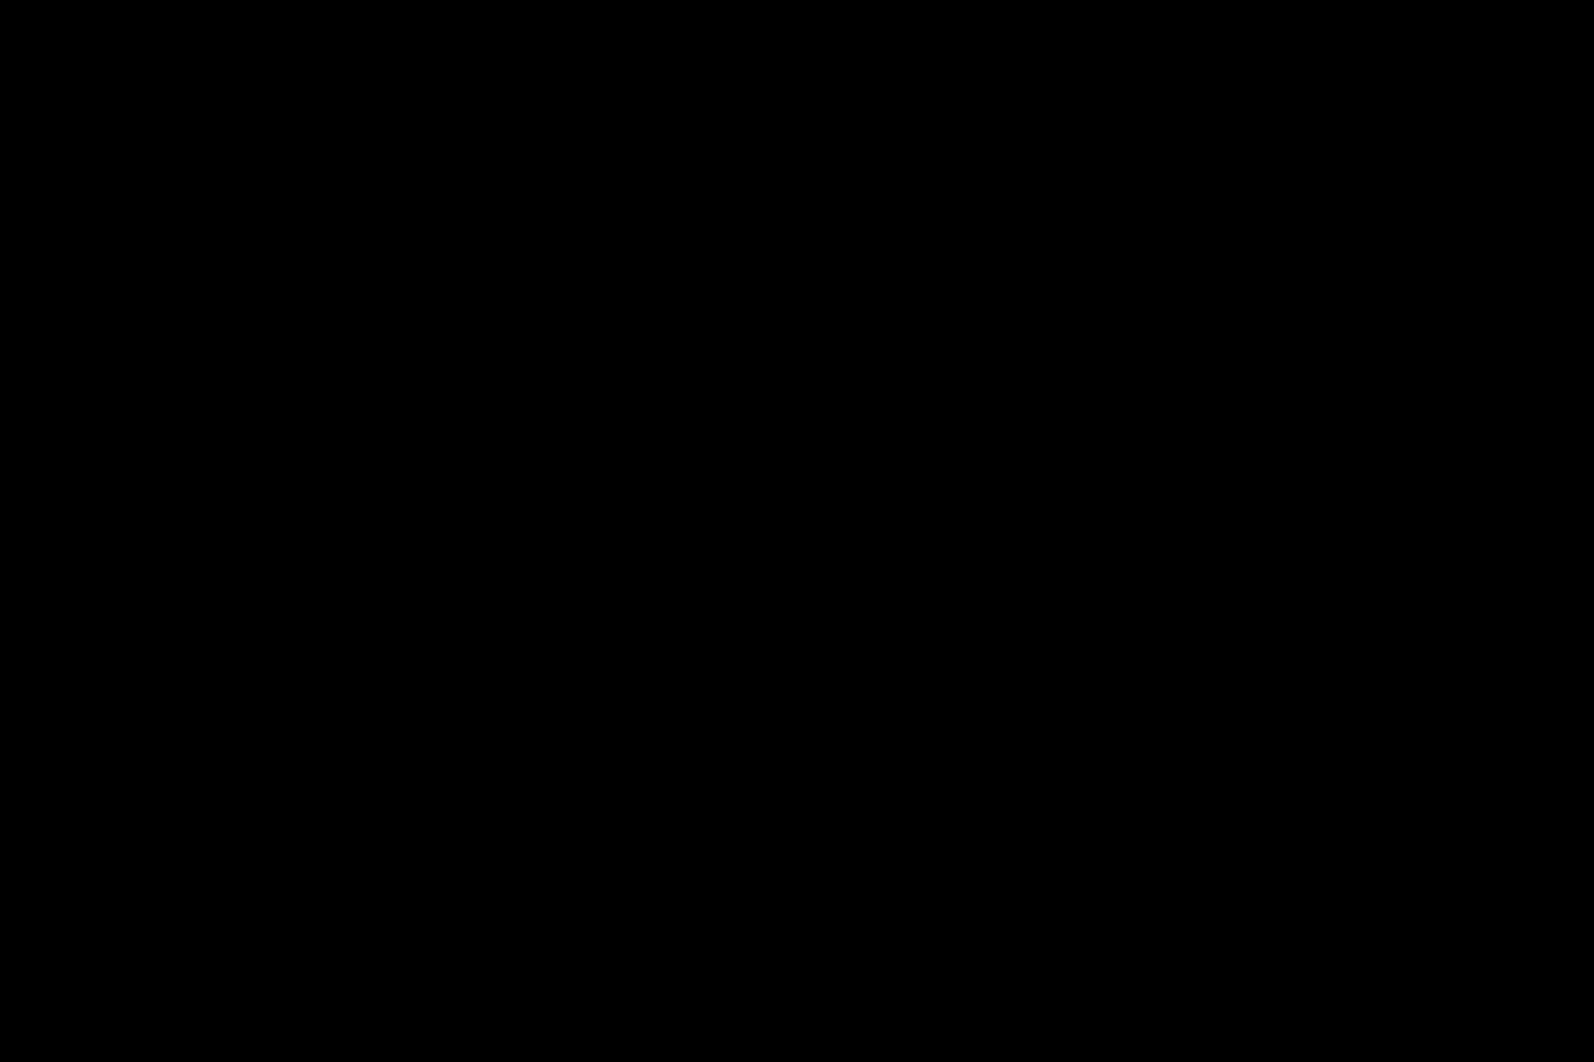 Outline : Scrolls Icon set - CHNOS 01 01 -